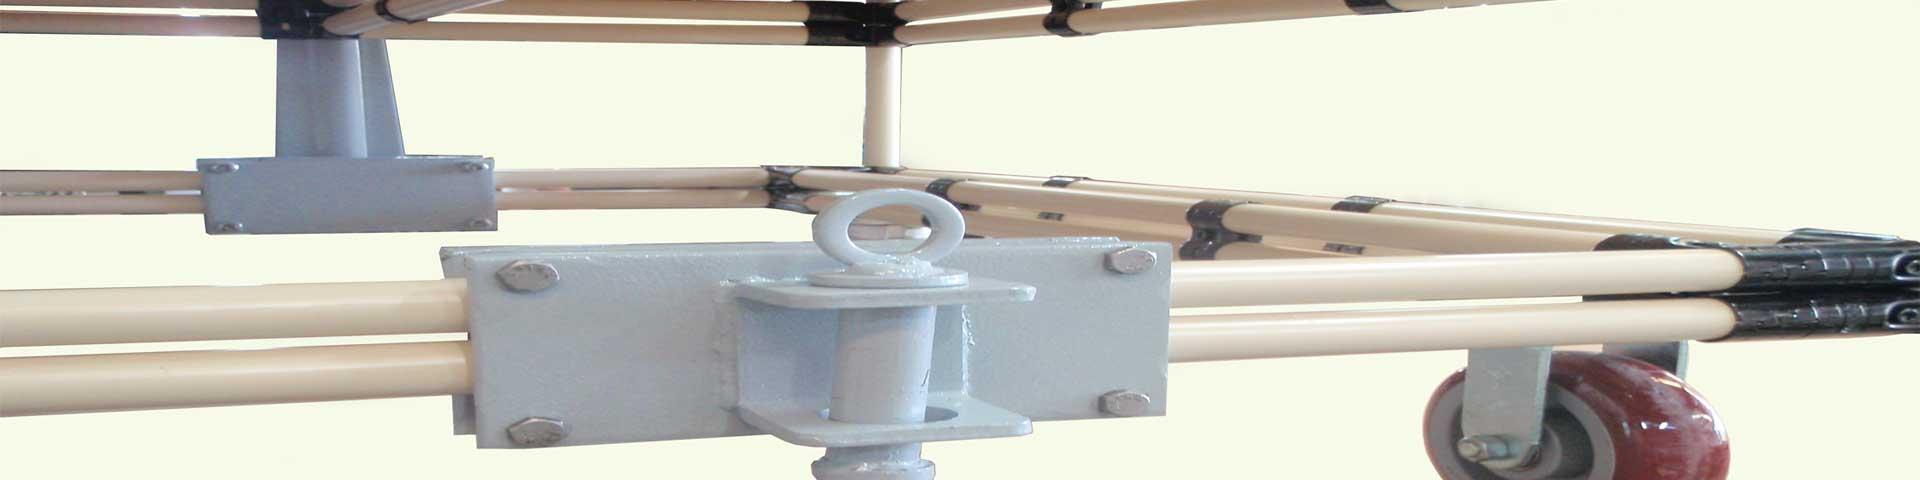 estructura-lean-sistema-tubular